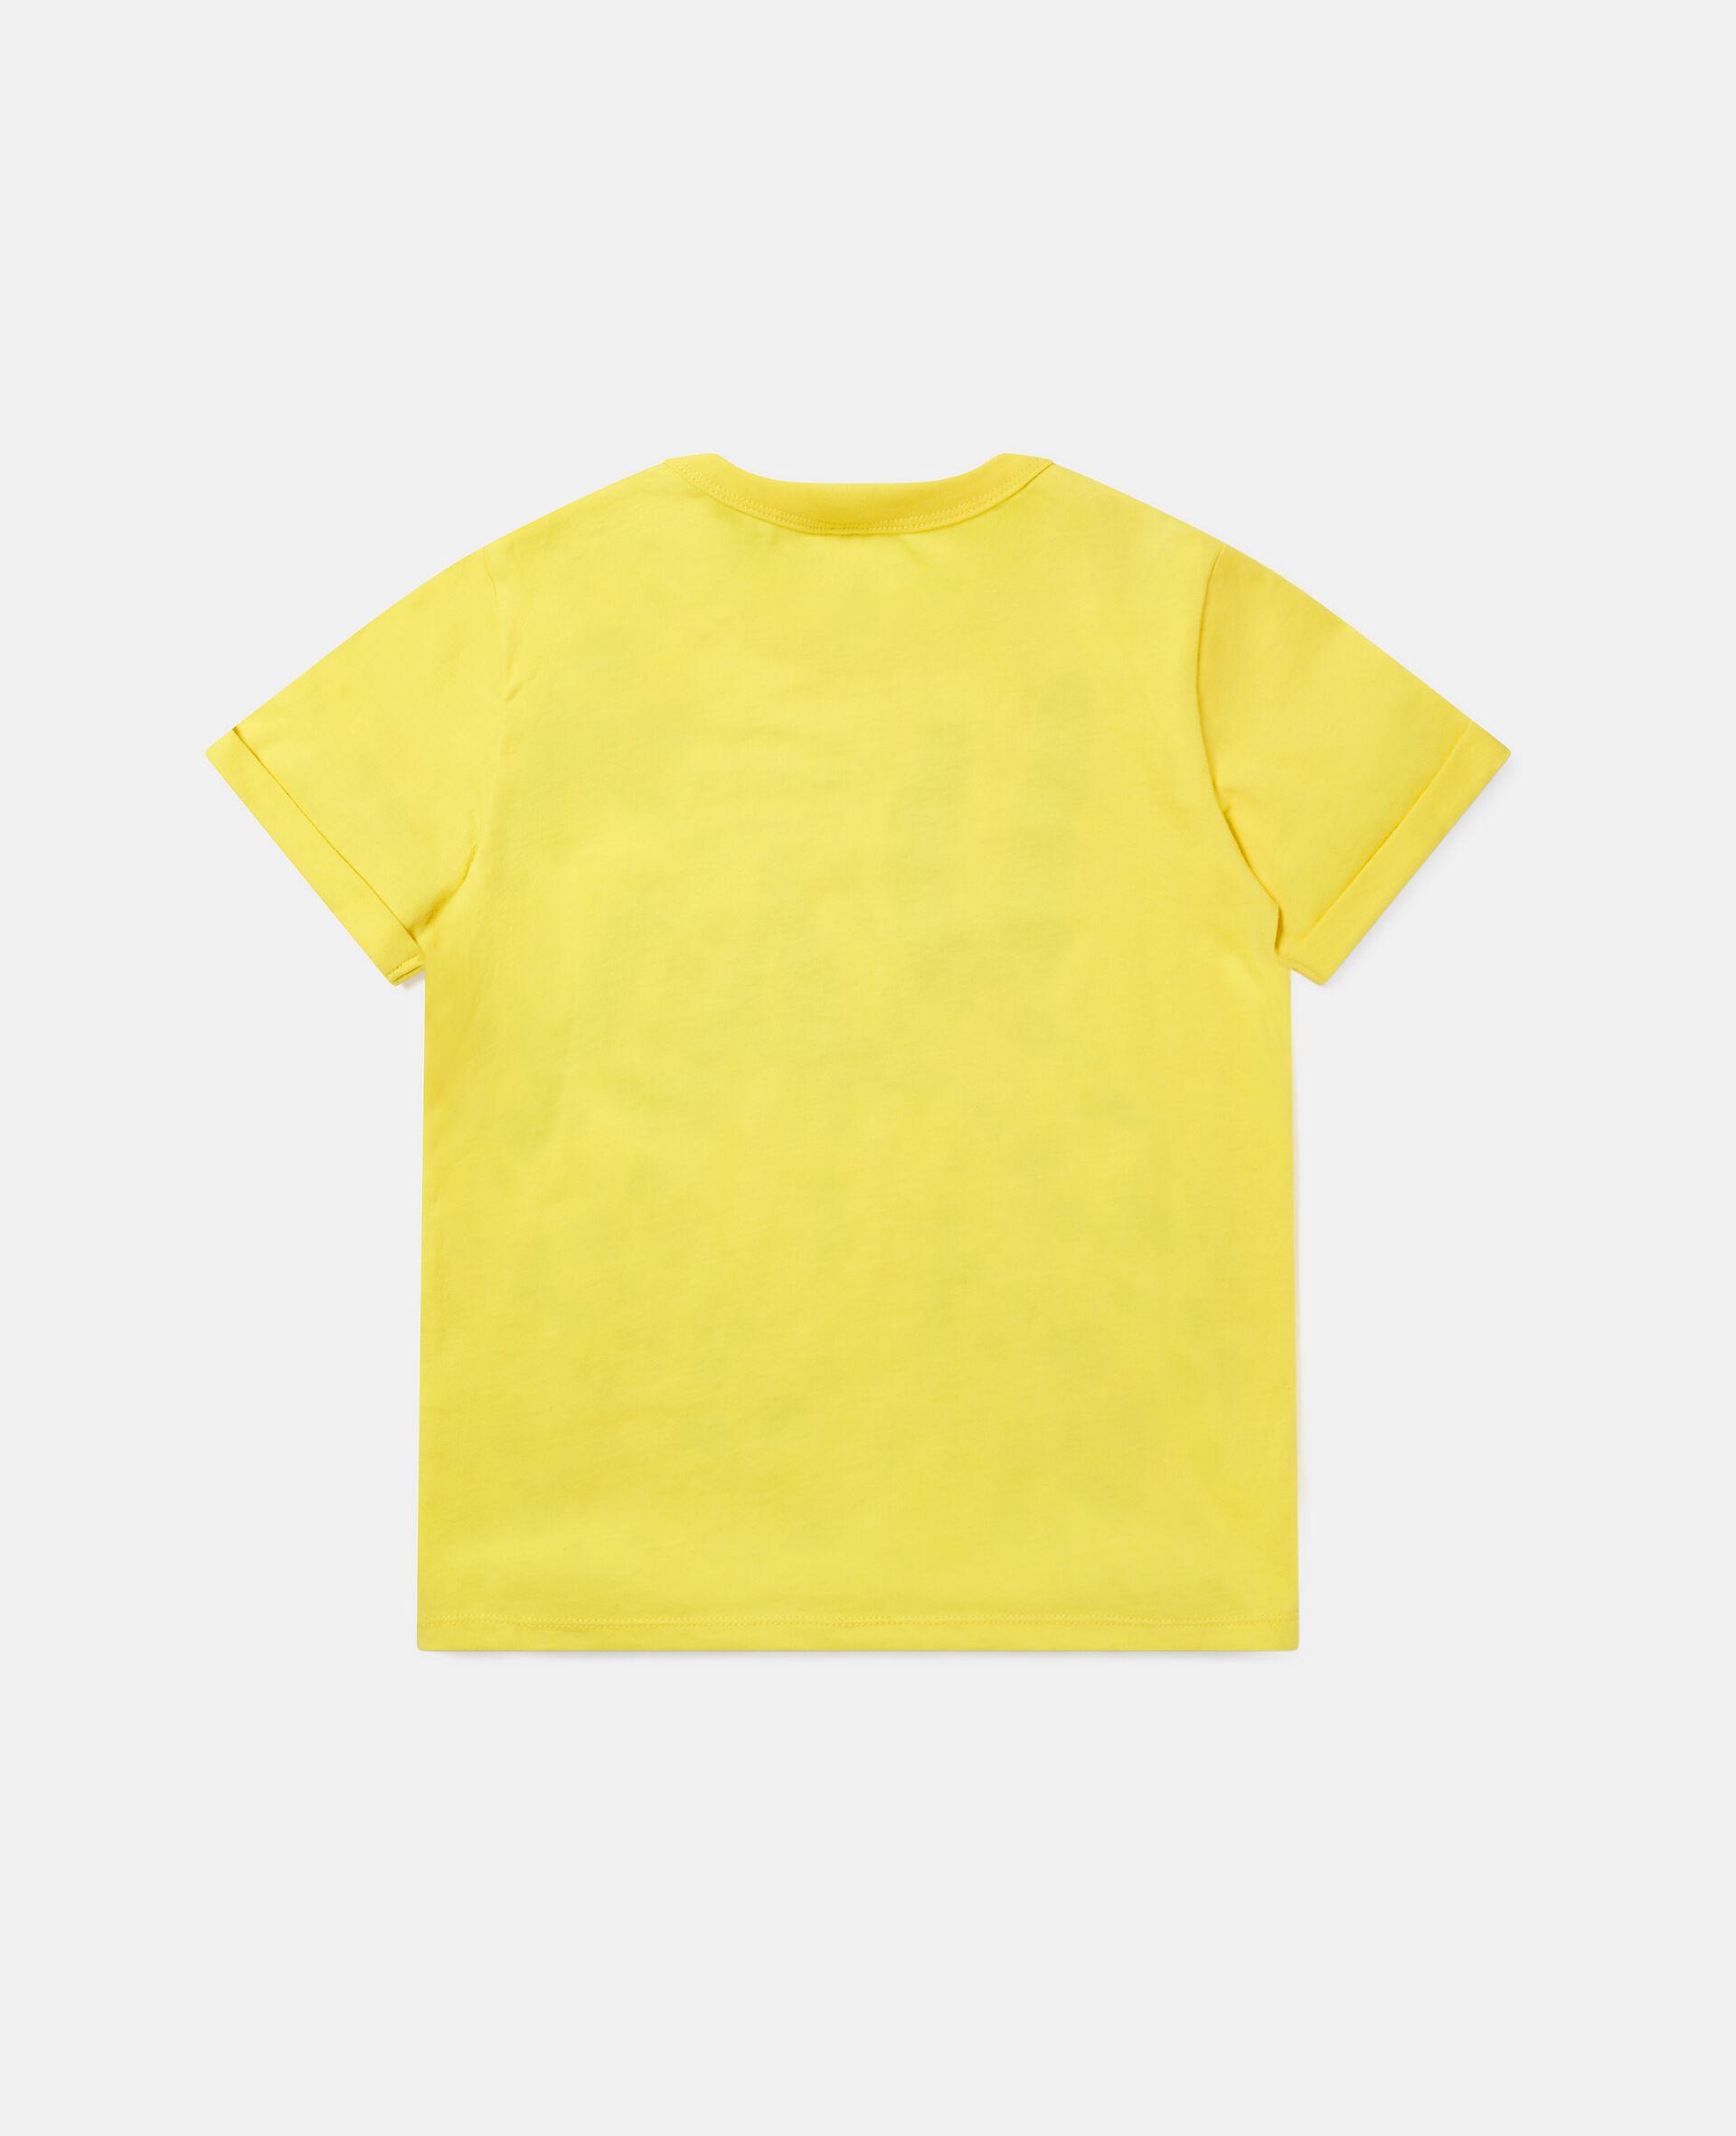 T-Shirt aus Baumwolle mit Dalmatiner-Print -Gelb-large image number 3